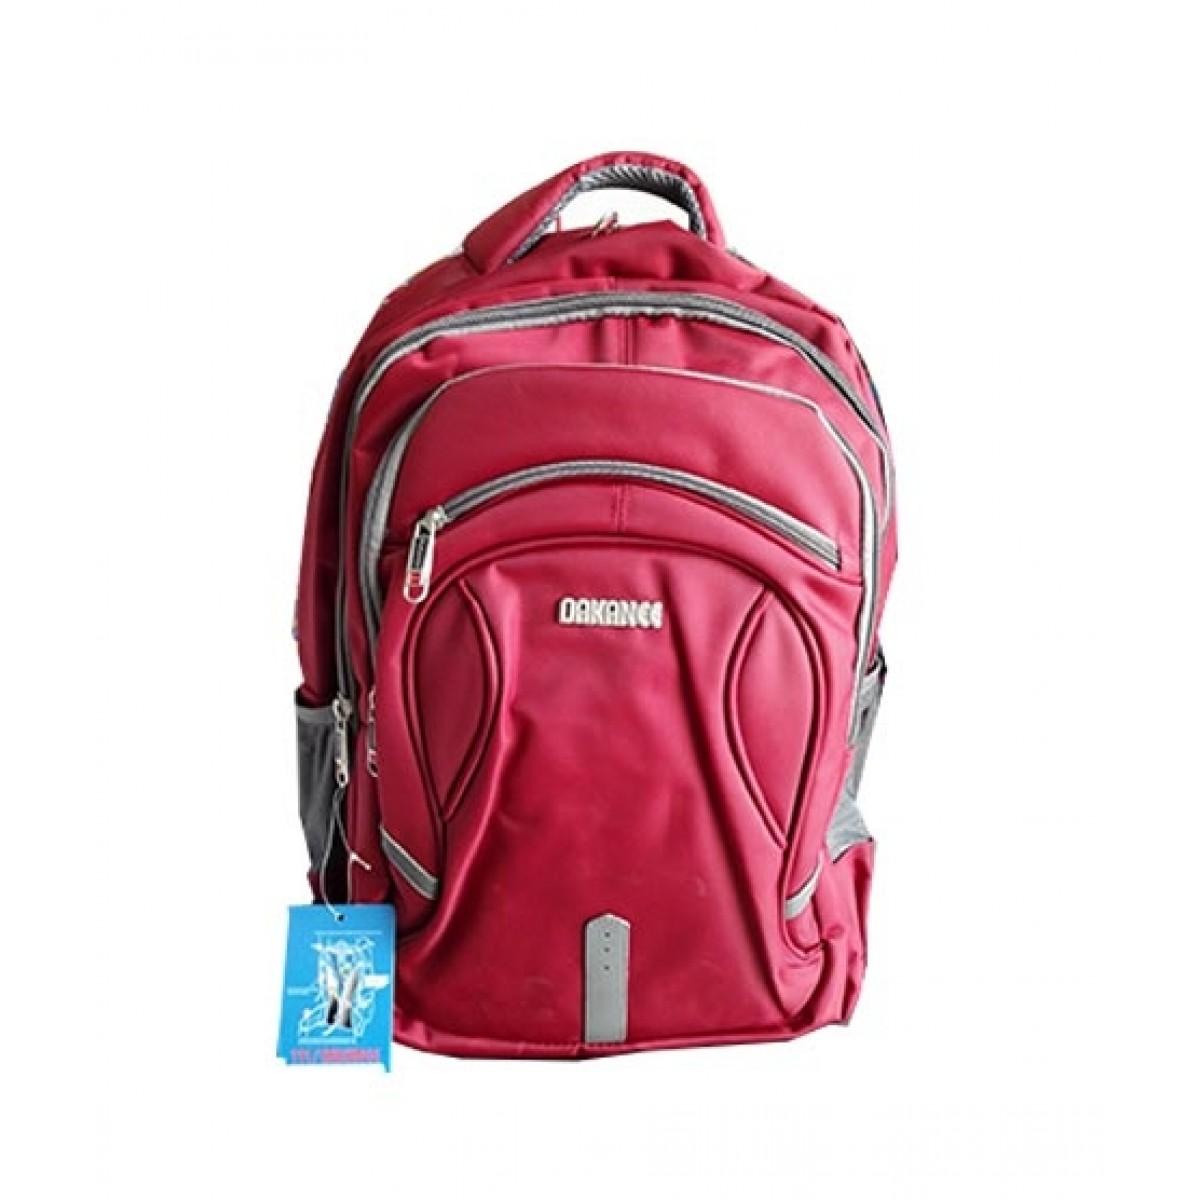 M Toys School Bag For Kids (0912)